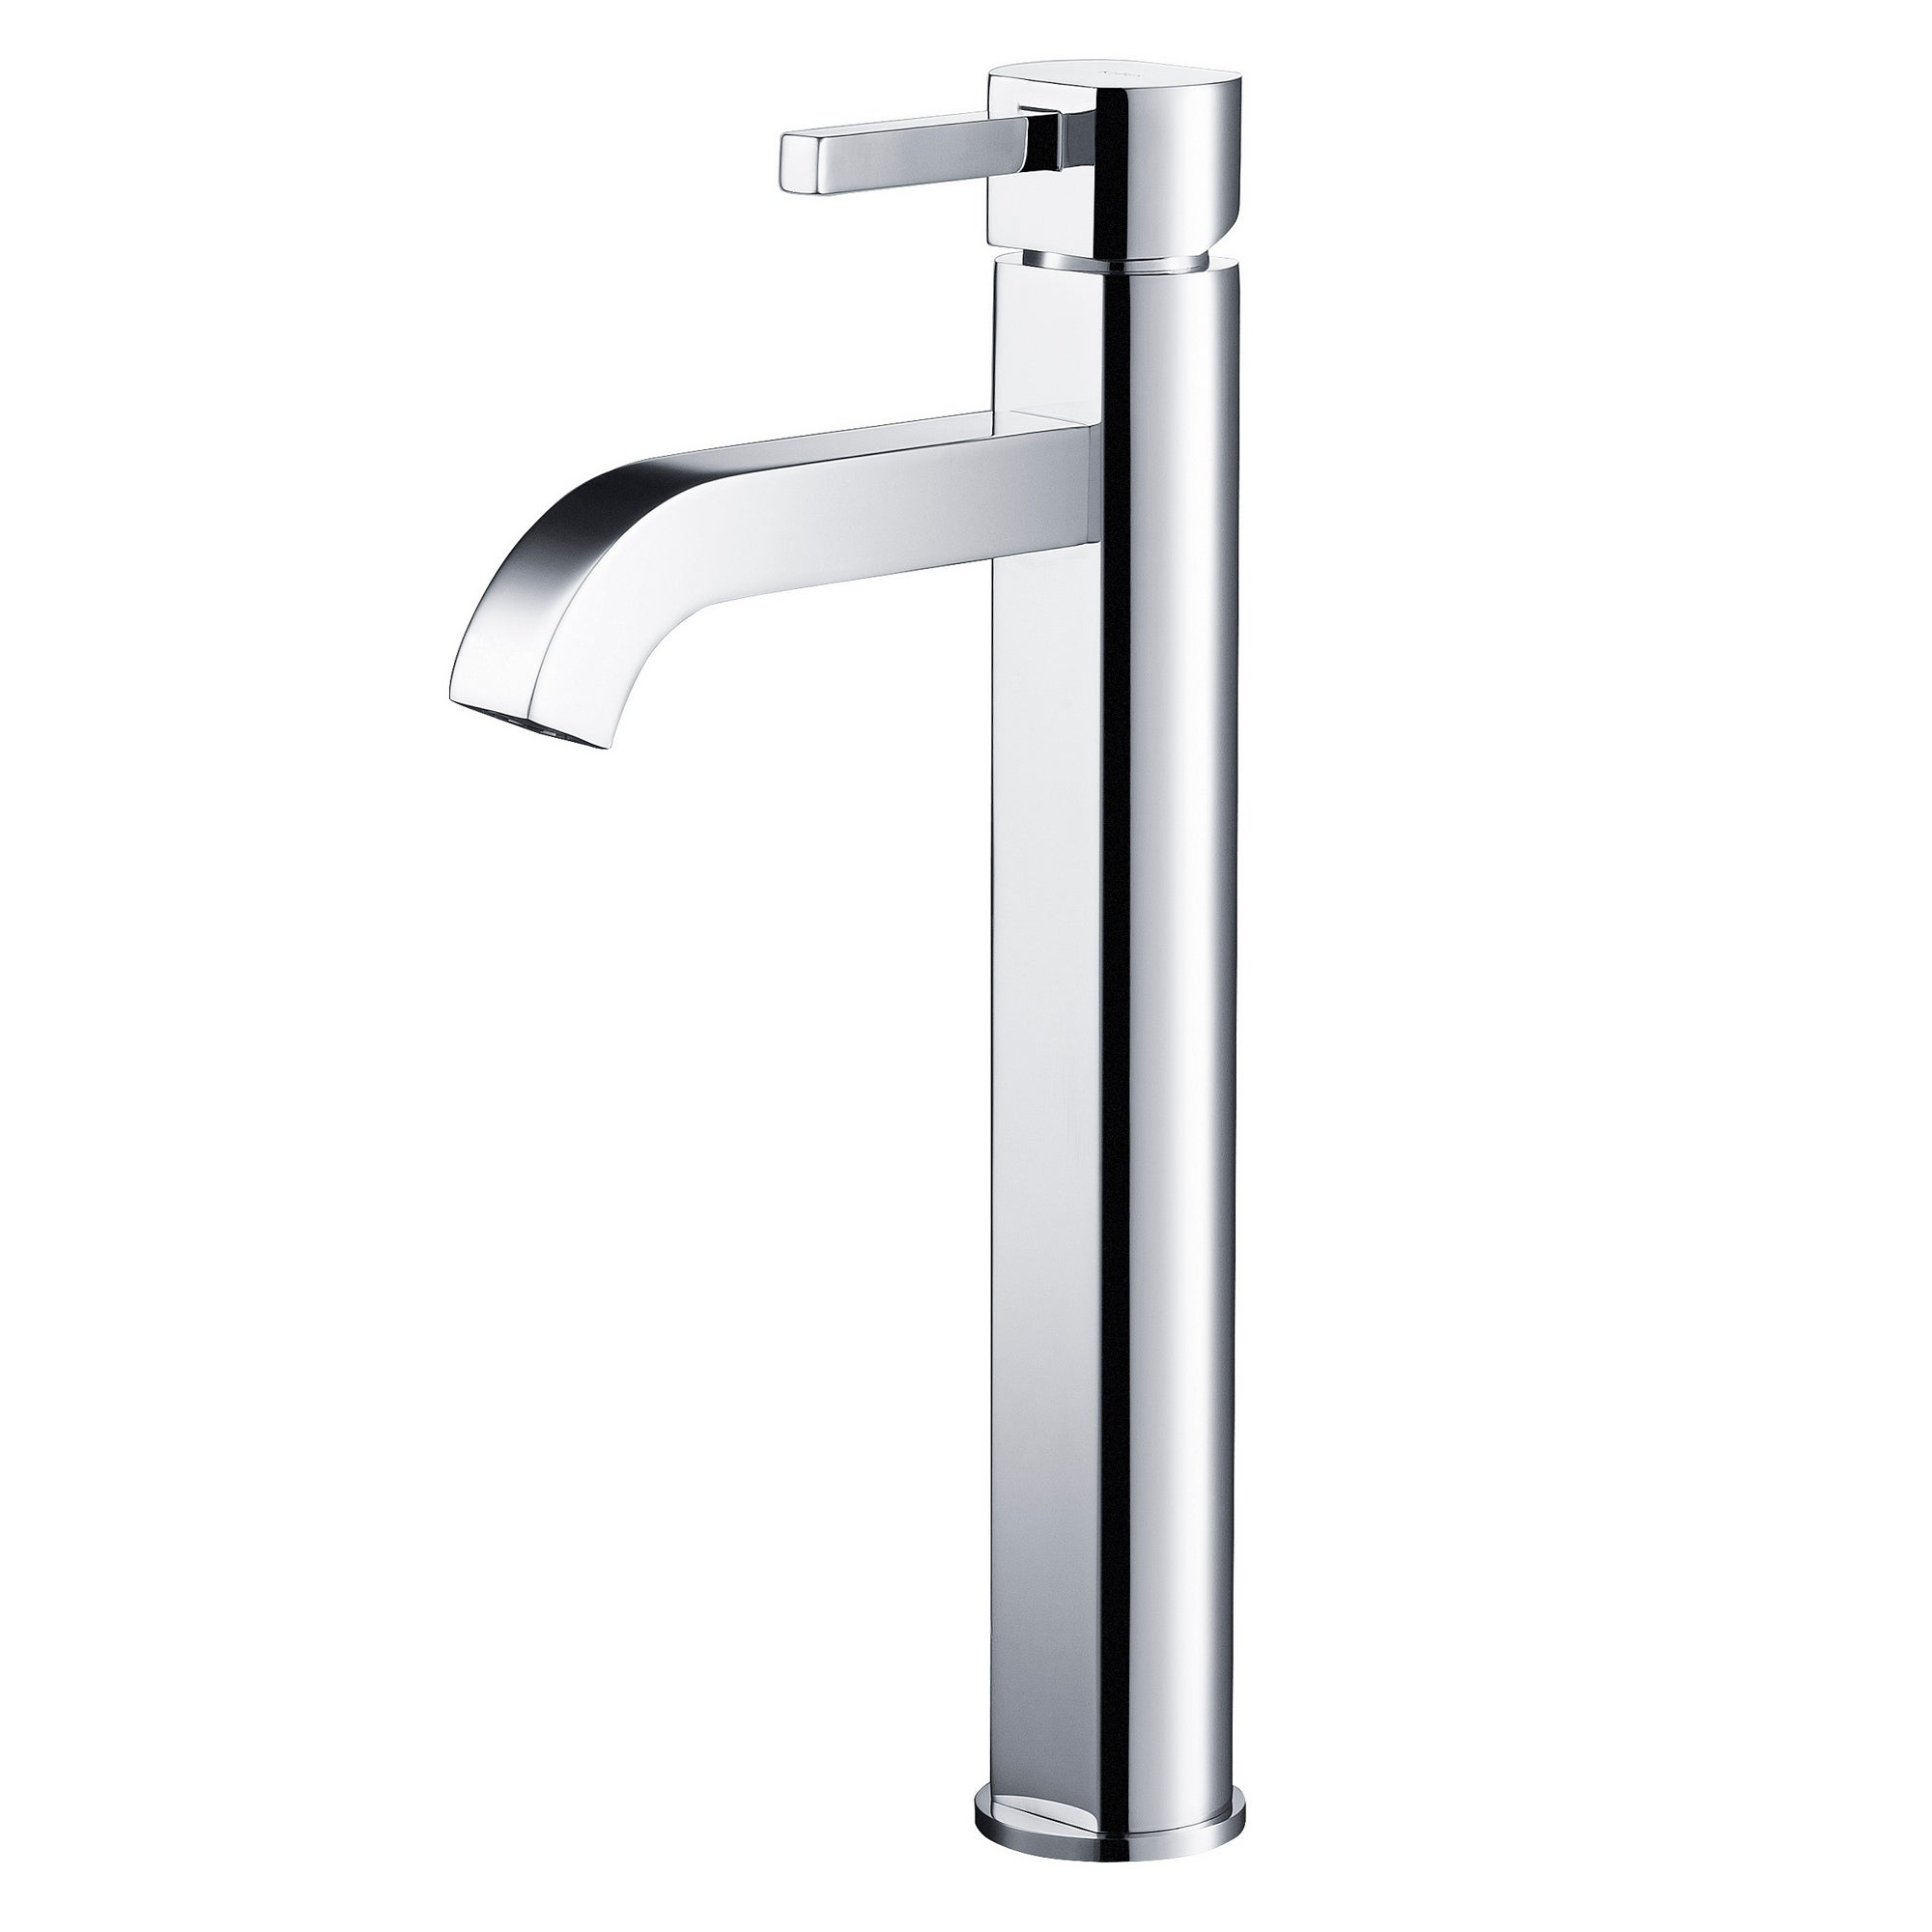 Shop Kraus FVS-1007 Ramus Single Hole Single-Handle Bathroom Vessel ...